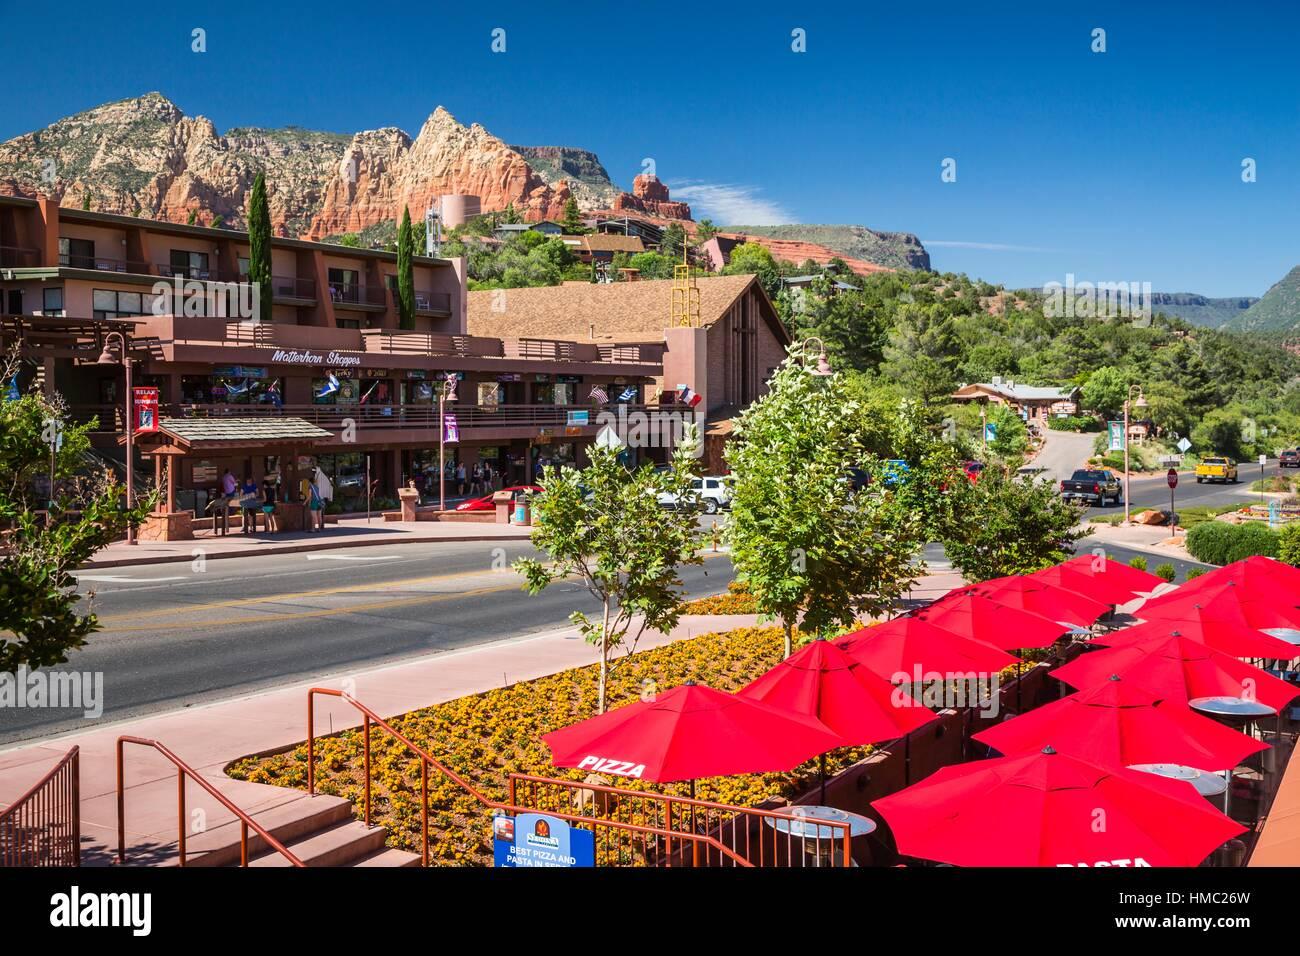 Shops And Restaurants In Downtown Sedona Arizona Usa Stock